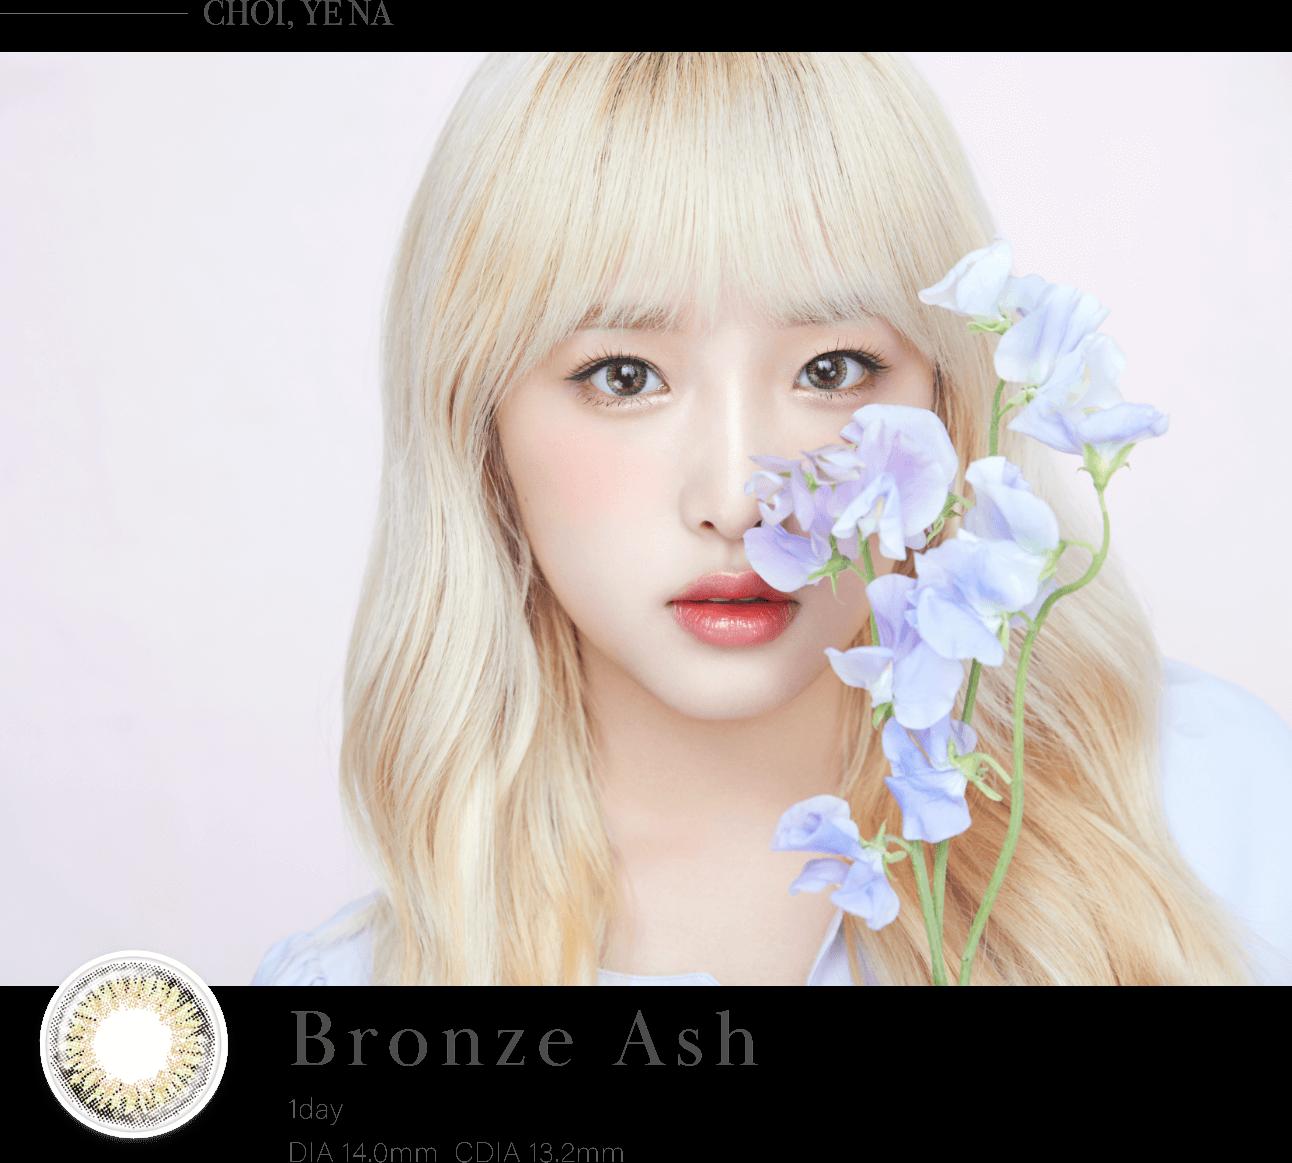 Bronze Ash